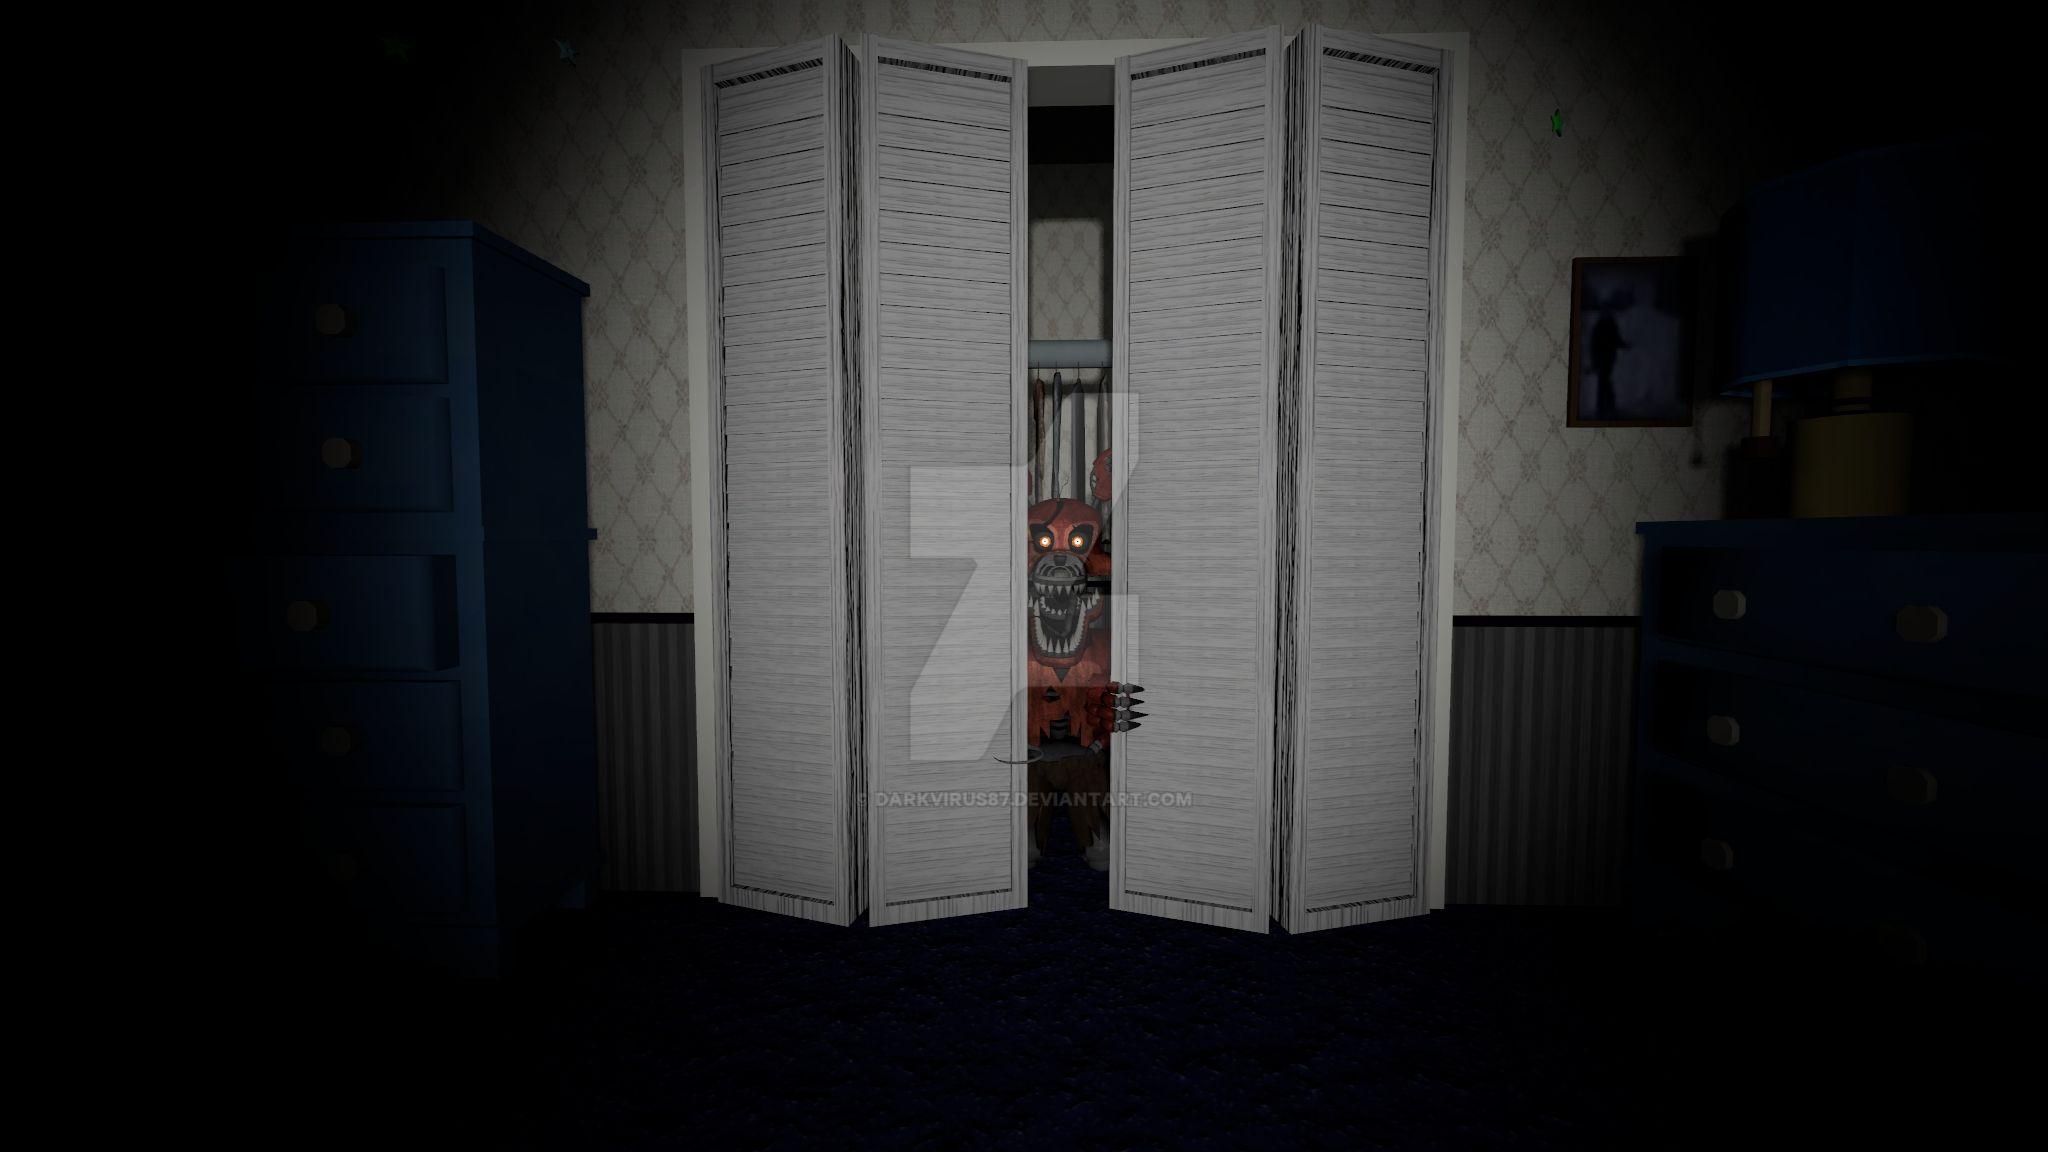 [FNaF SFM] Nightmare Foxy by DarkVirus87